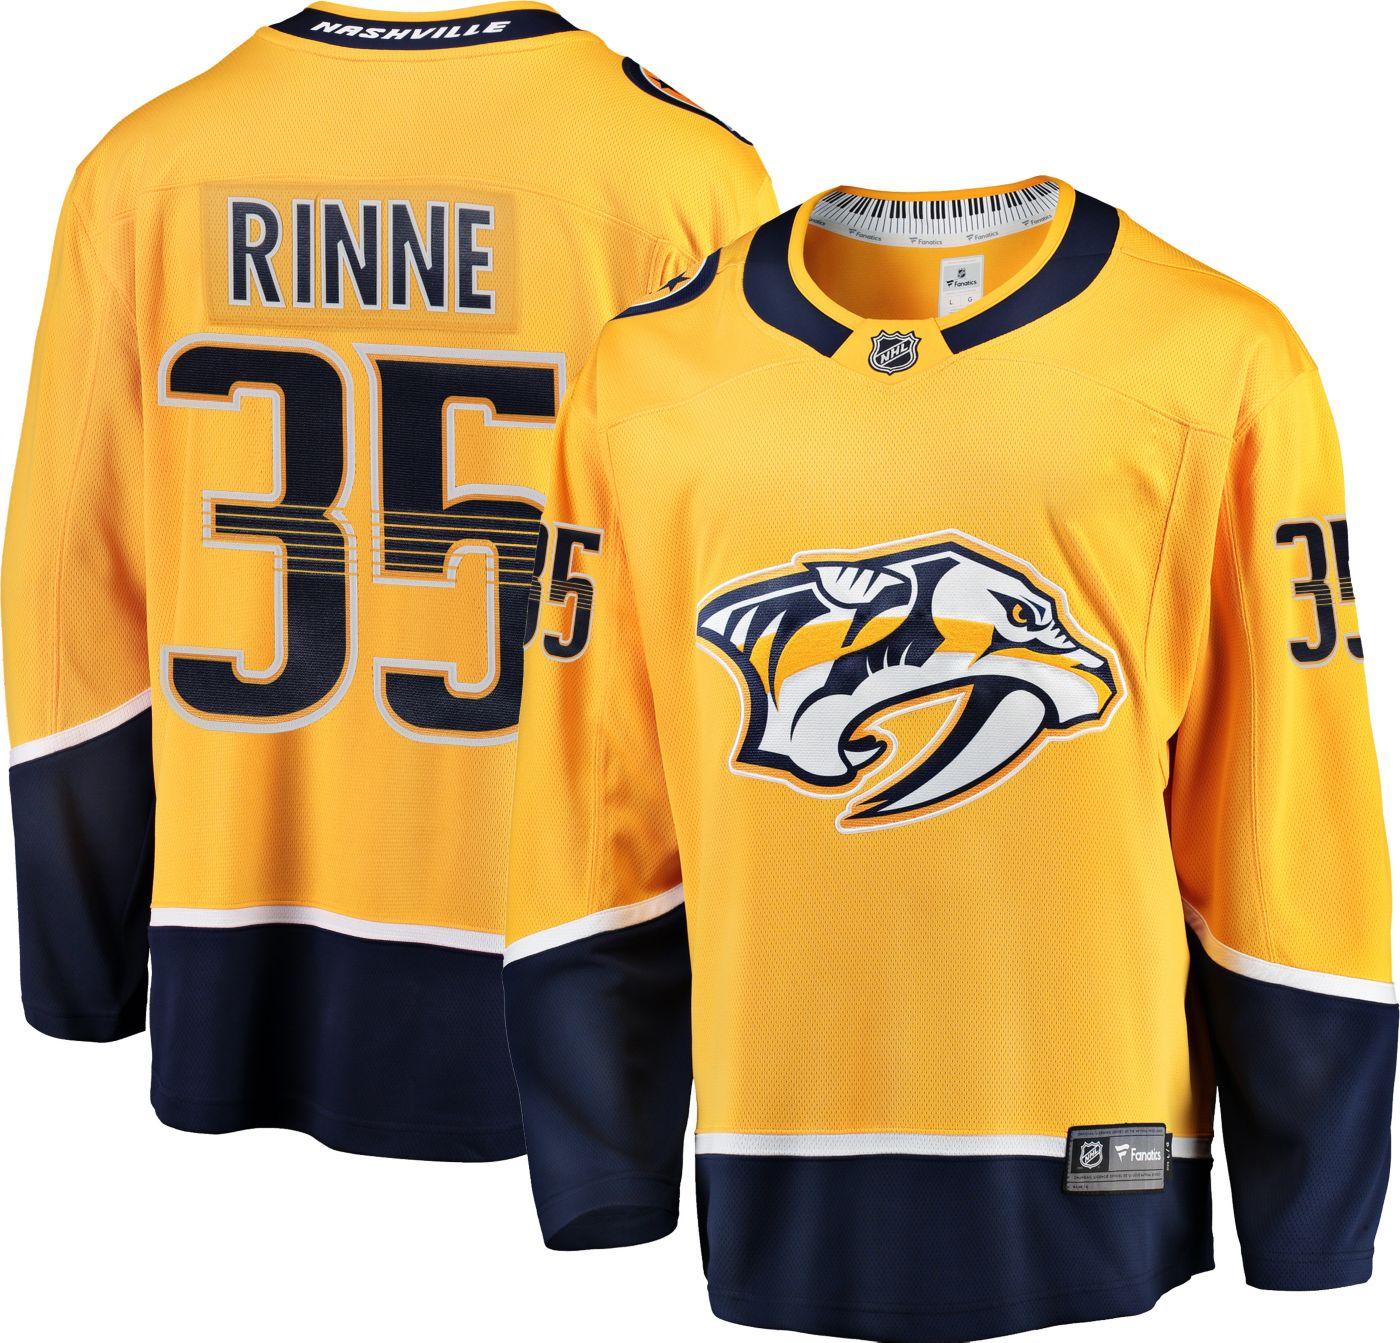 NHL Men's Nashville Predators Pekka Rinne #35 Breakaway Home Replica Jersey